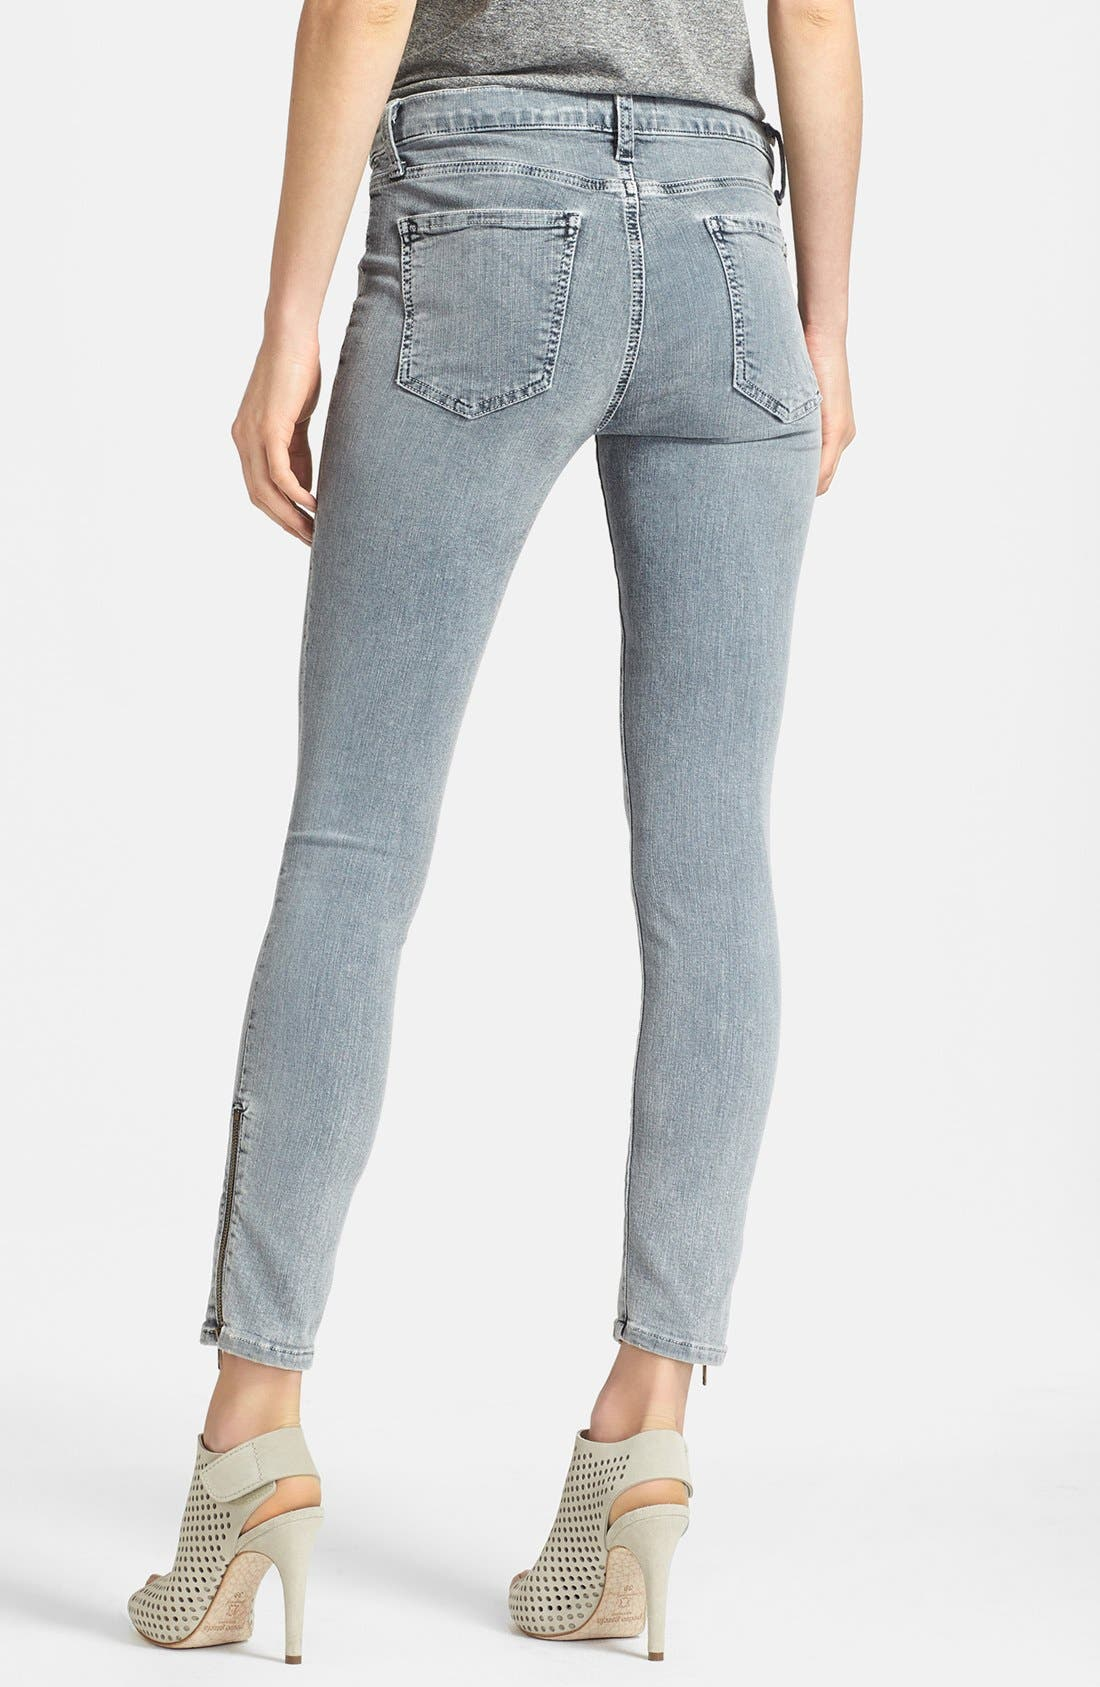 Alternate Image 2  - Current/Elliott 'The Soho' Zip Stiletto Skinny Jeans (Bleach Out Navy)